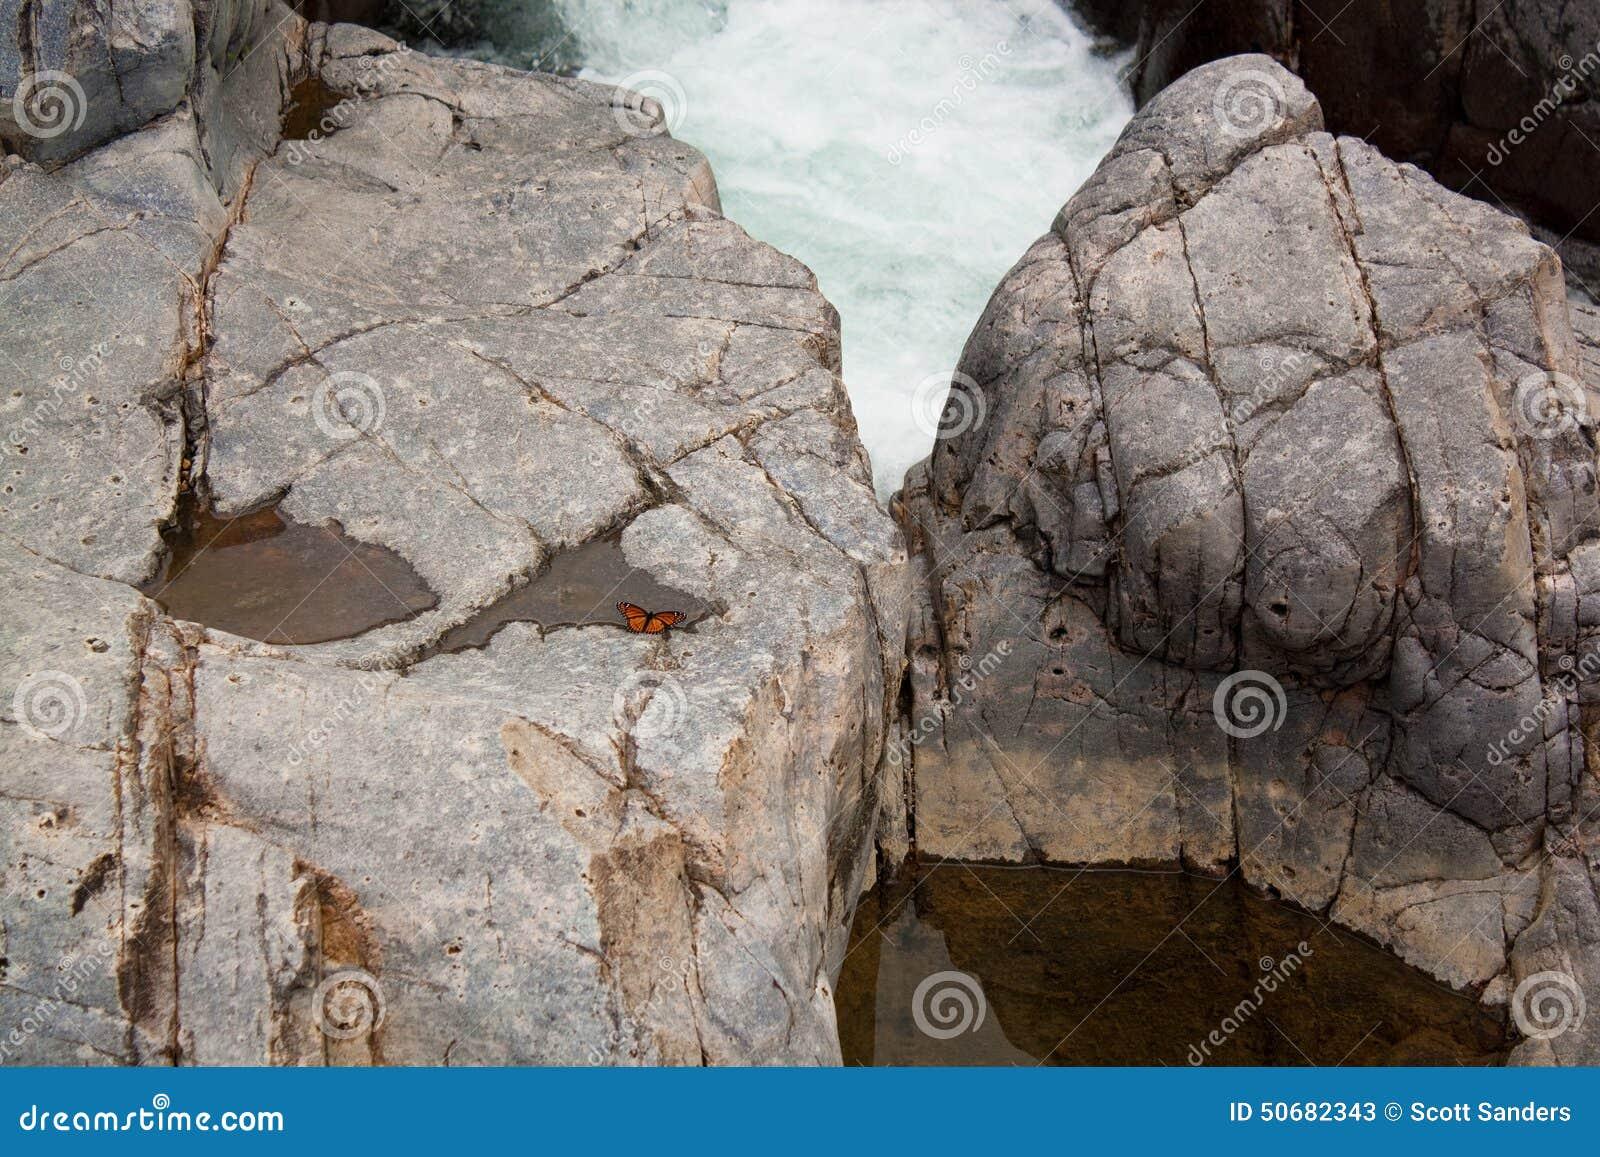 Download 冰砾 库存图片. 图片 包括有 冰砾, 约翰逊, 瀑布, 空白, 密苏里, 水坑, 状态, 岩石 - 50682343